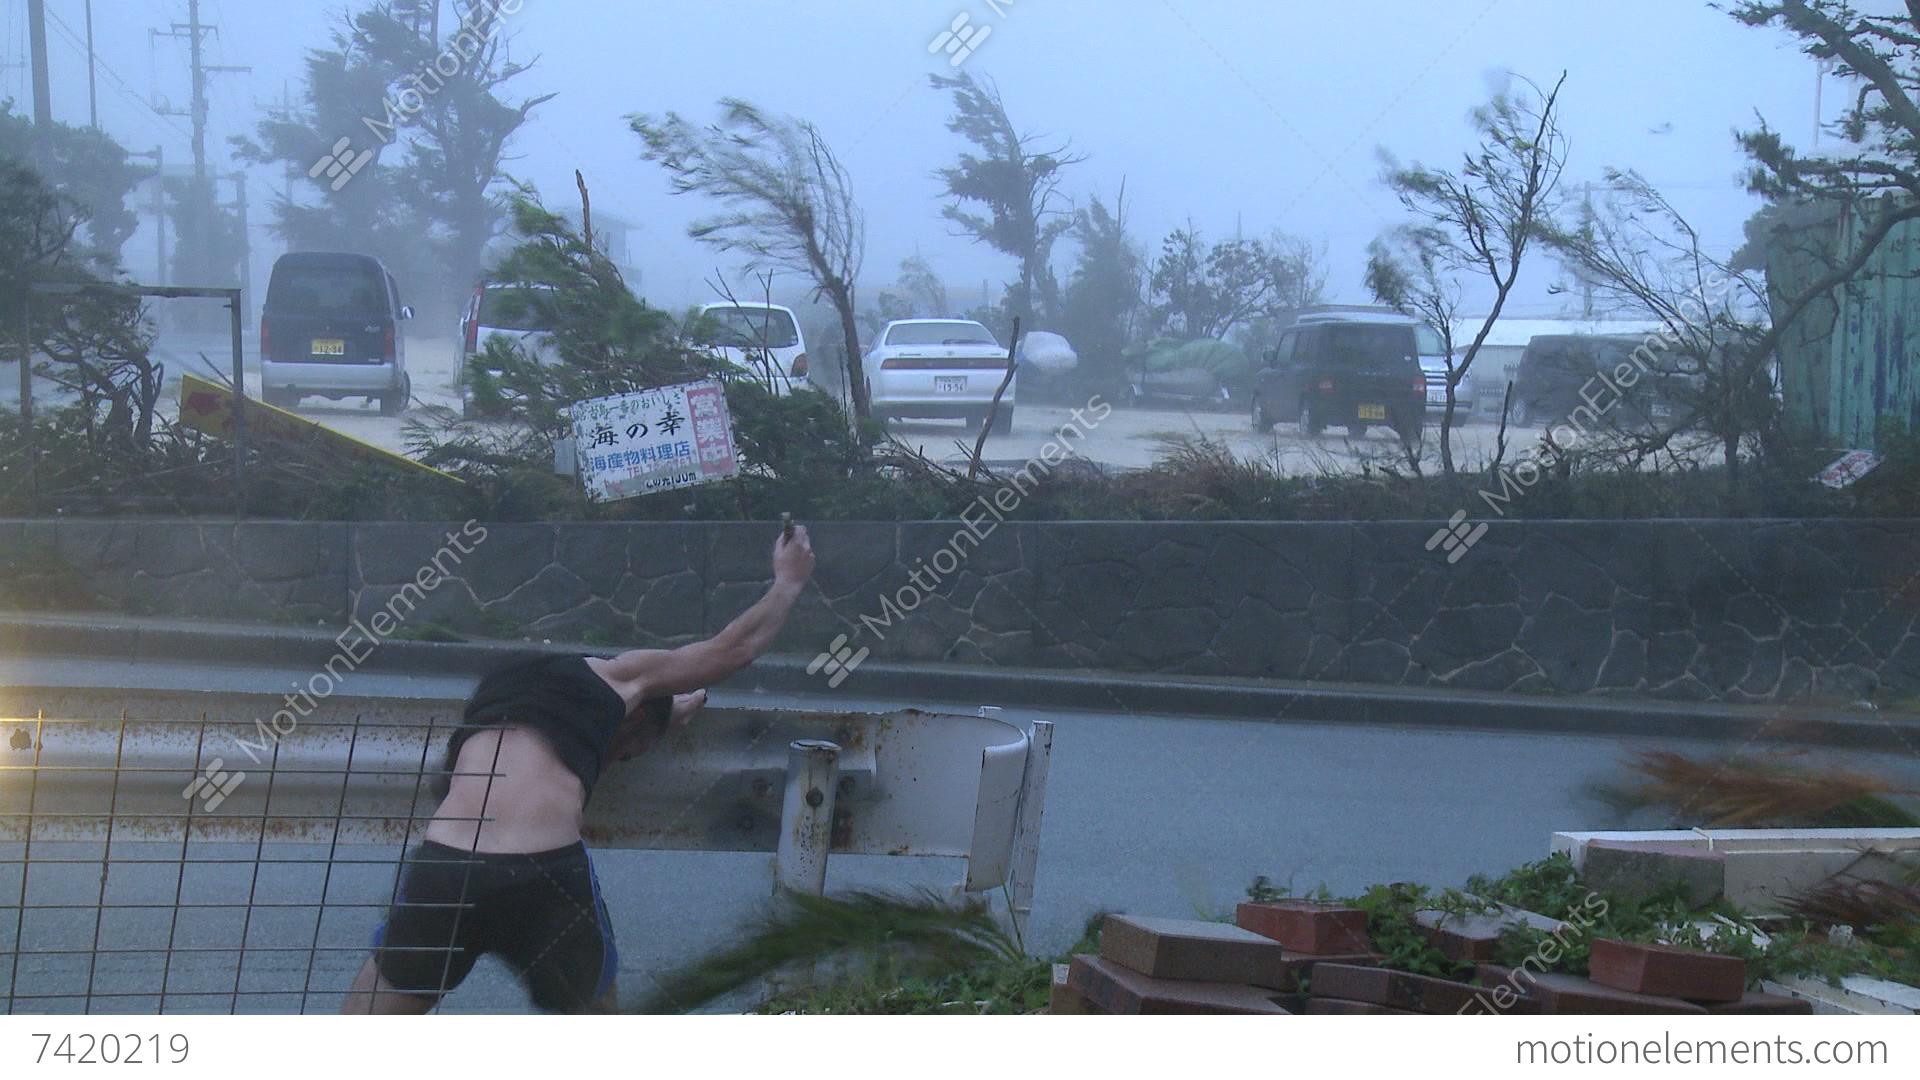 Hurricane Violent Winds Lash Scientist Flying Debris Stock ...